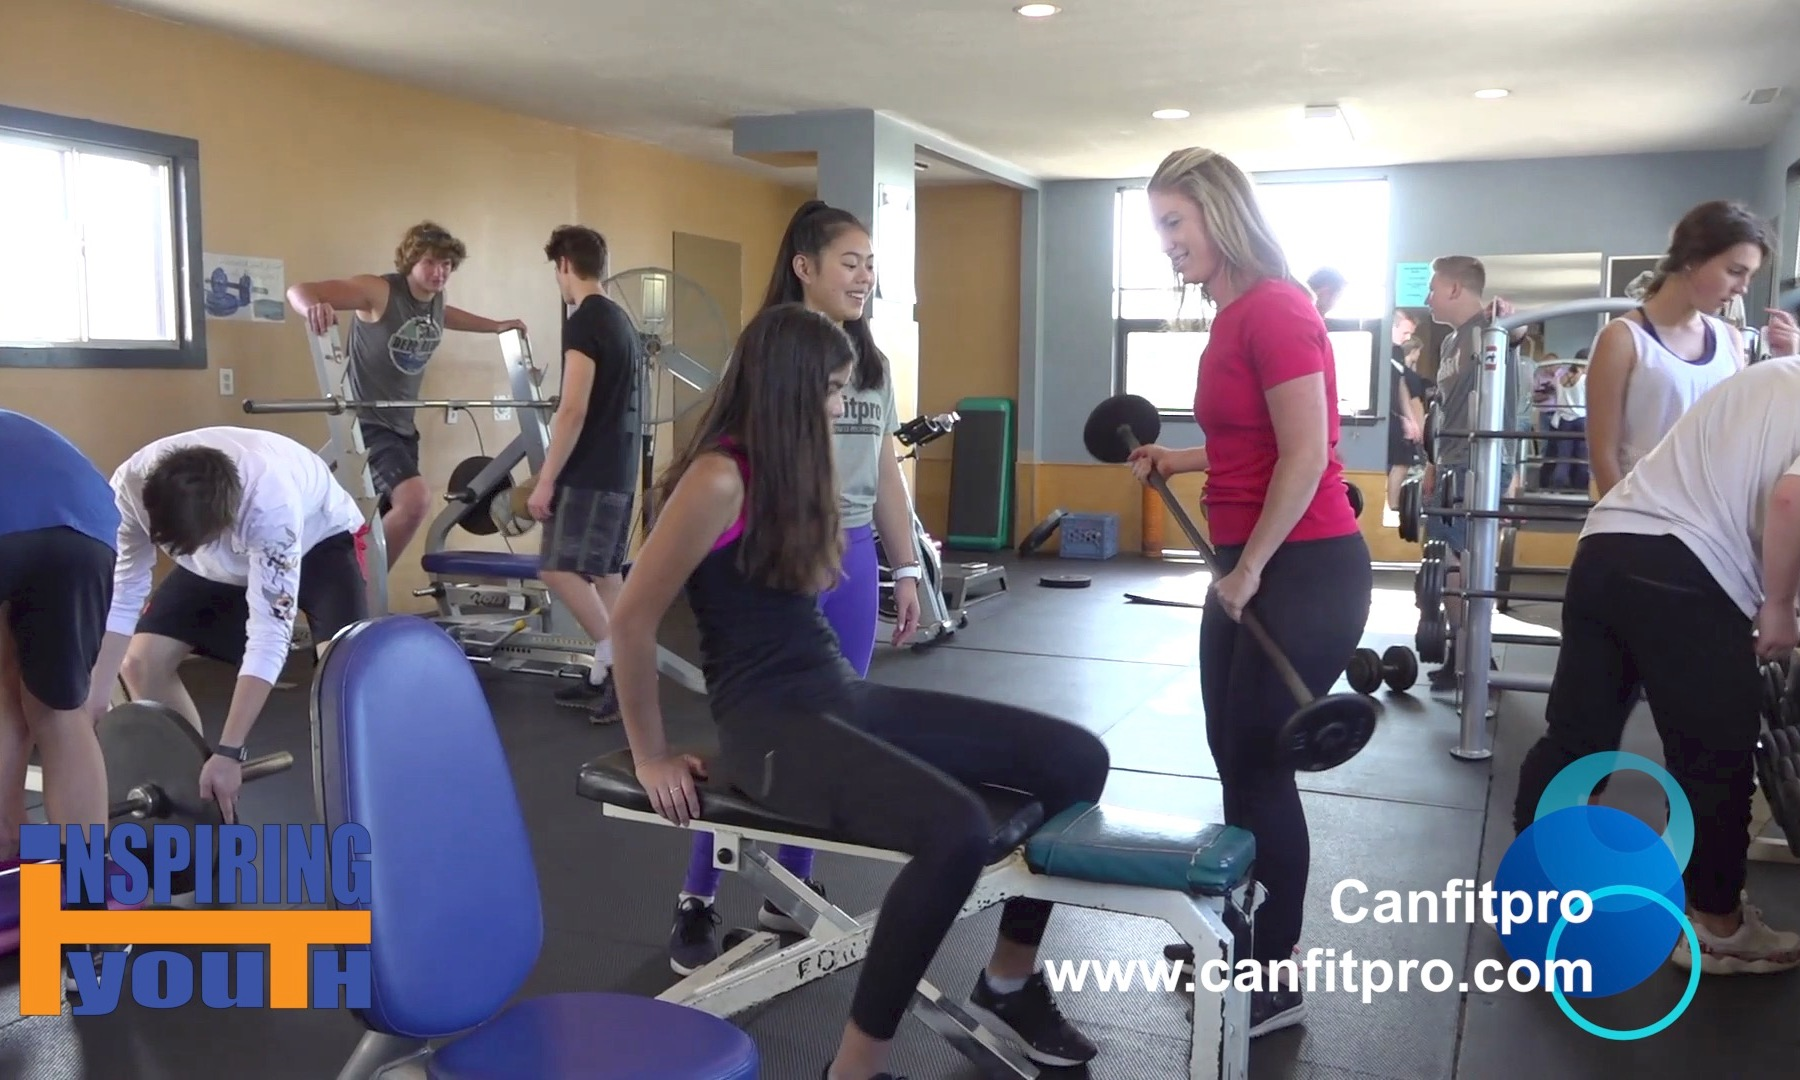 Canfitpro on Inspiring Youth